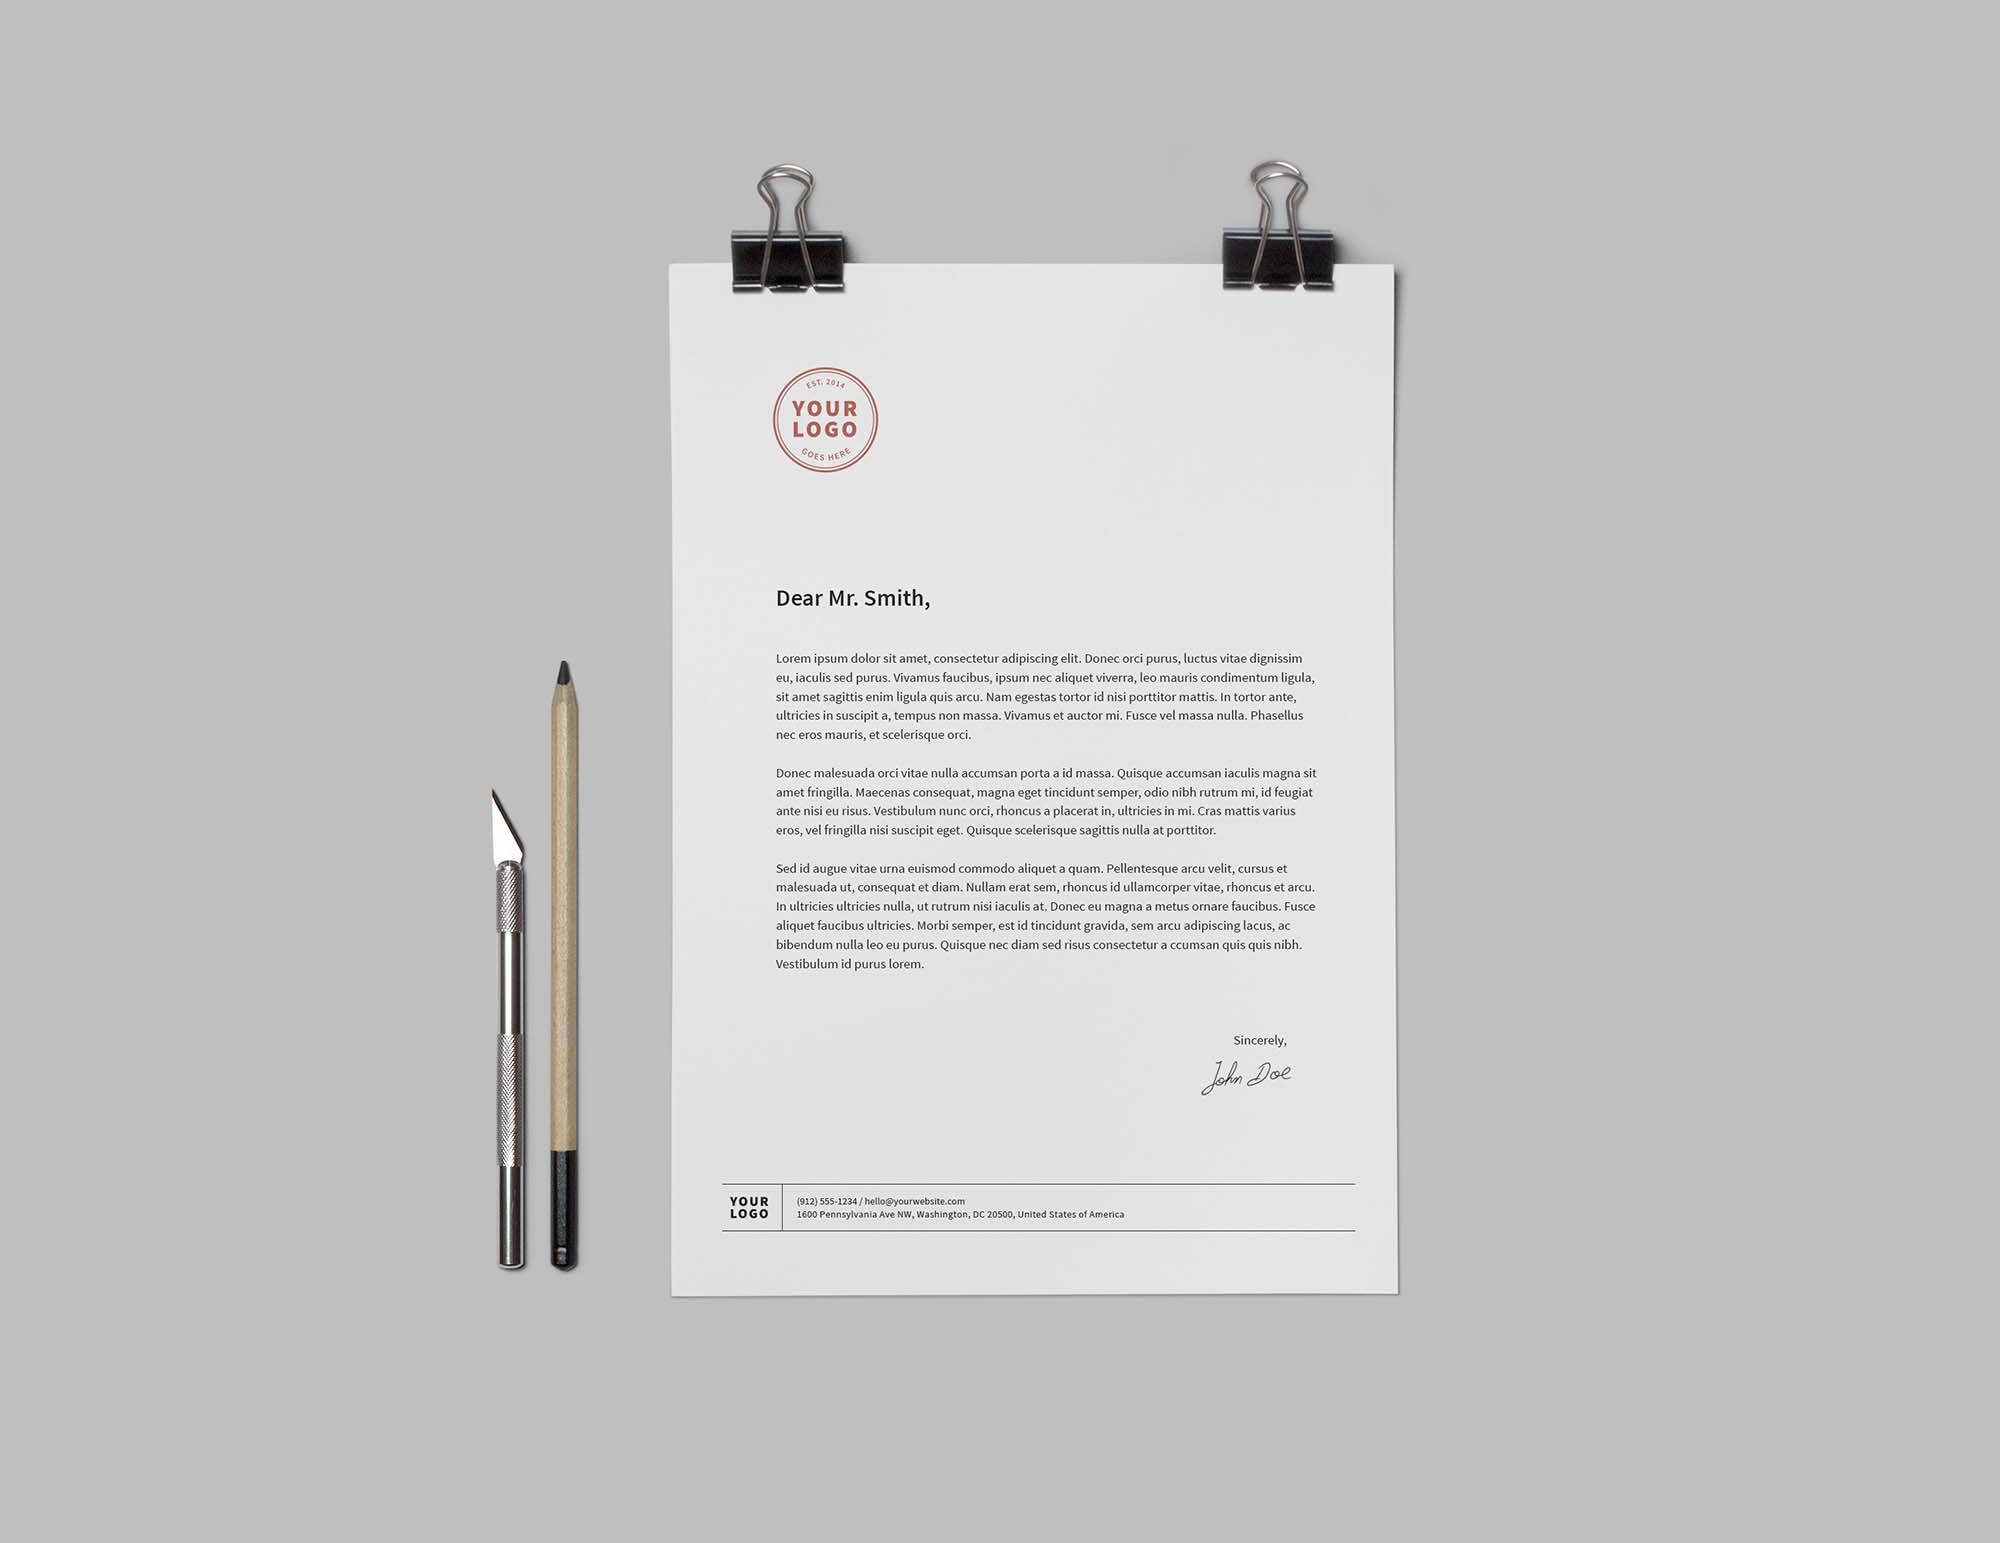 Branding and Identity Mockup - Letterhead